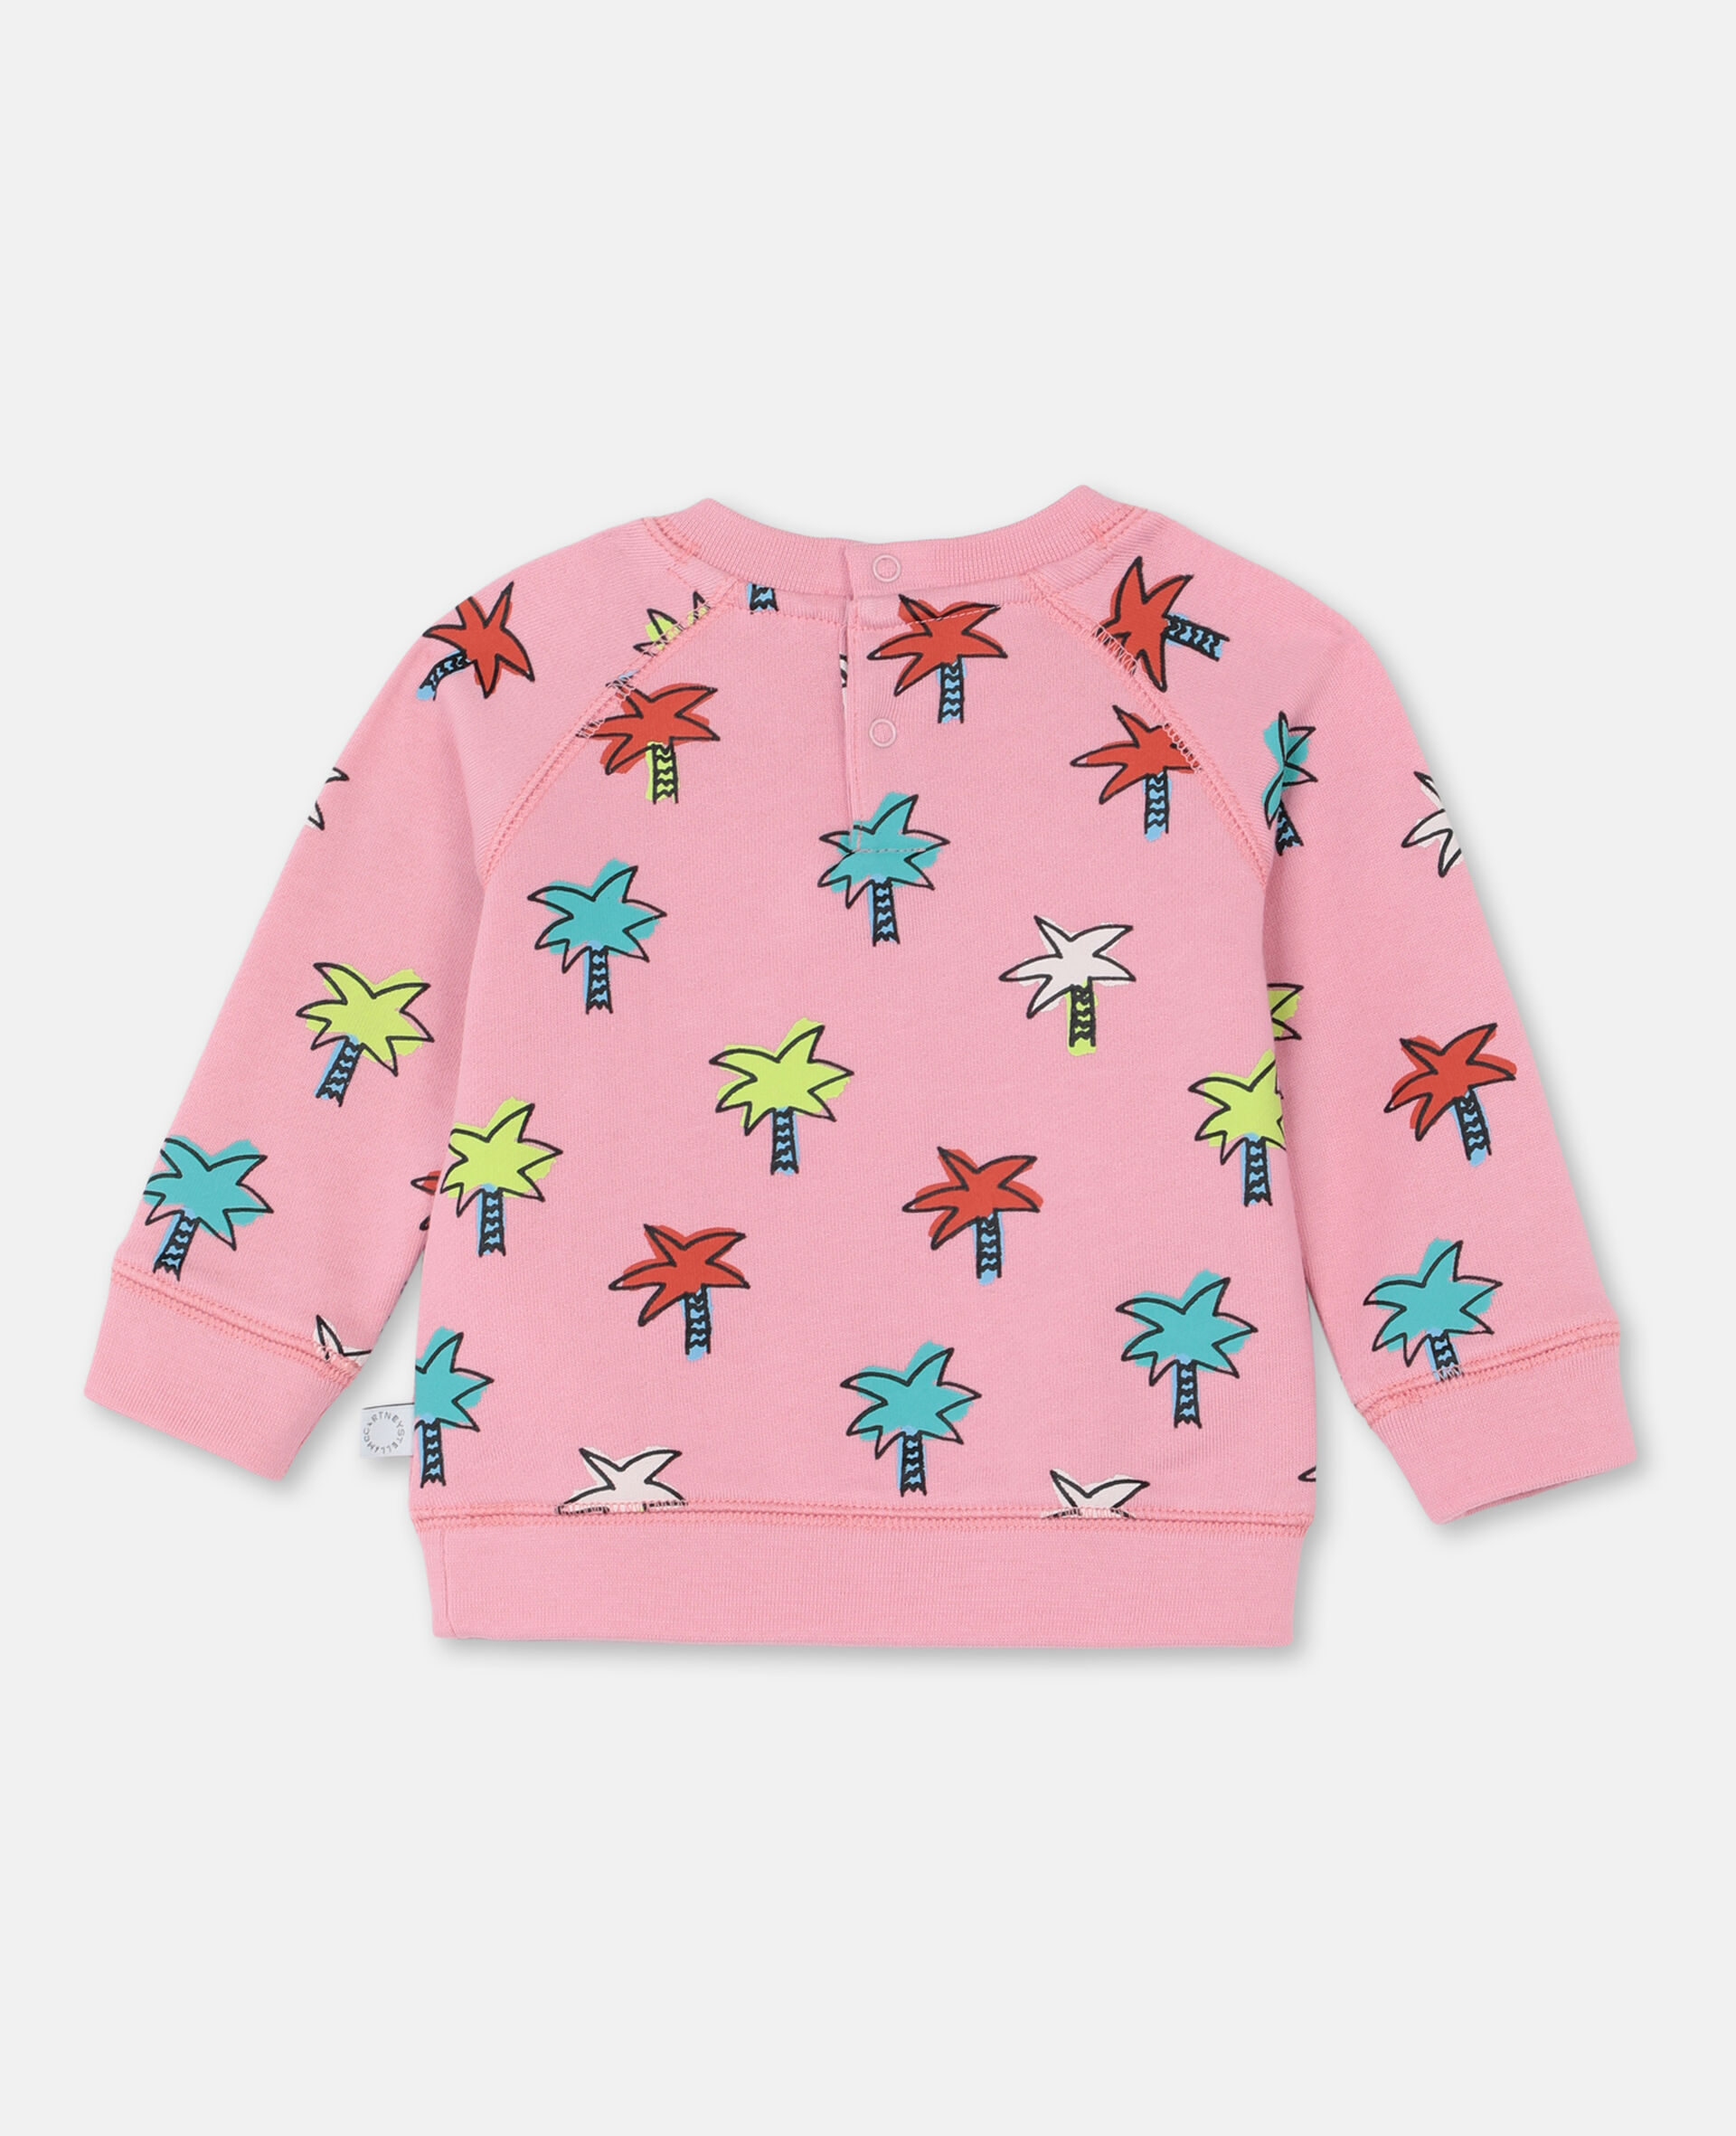 Doodly Palms Cotton Sweatshirt -Pink-large image number 3